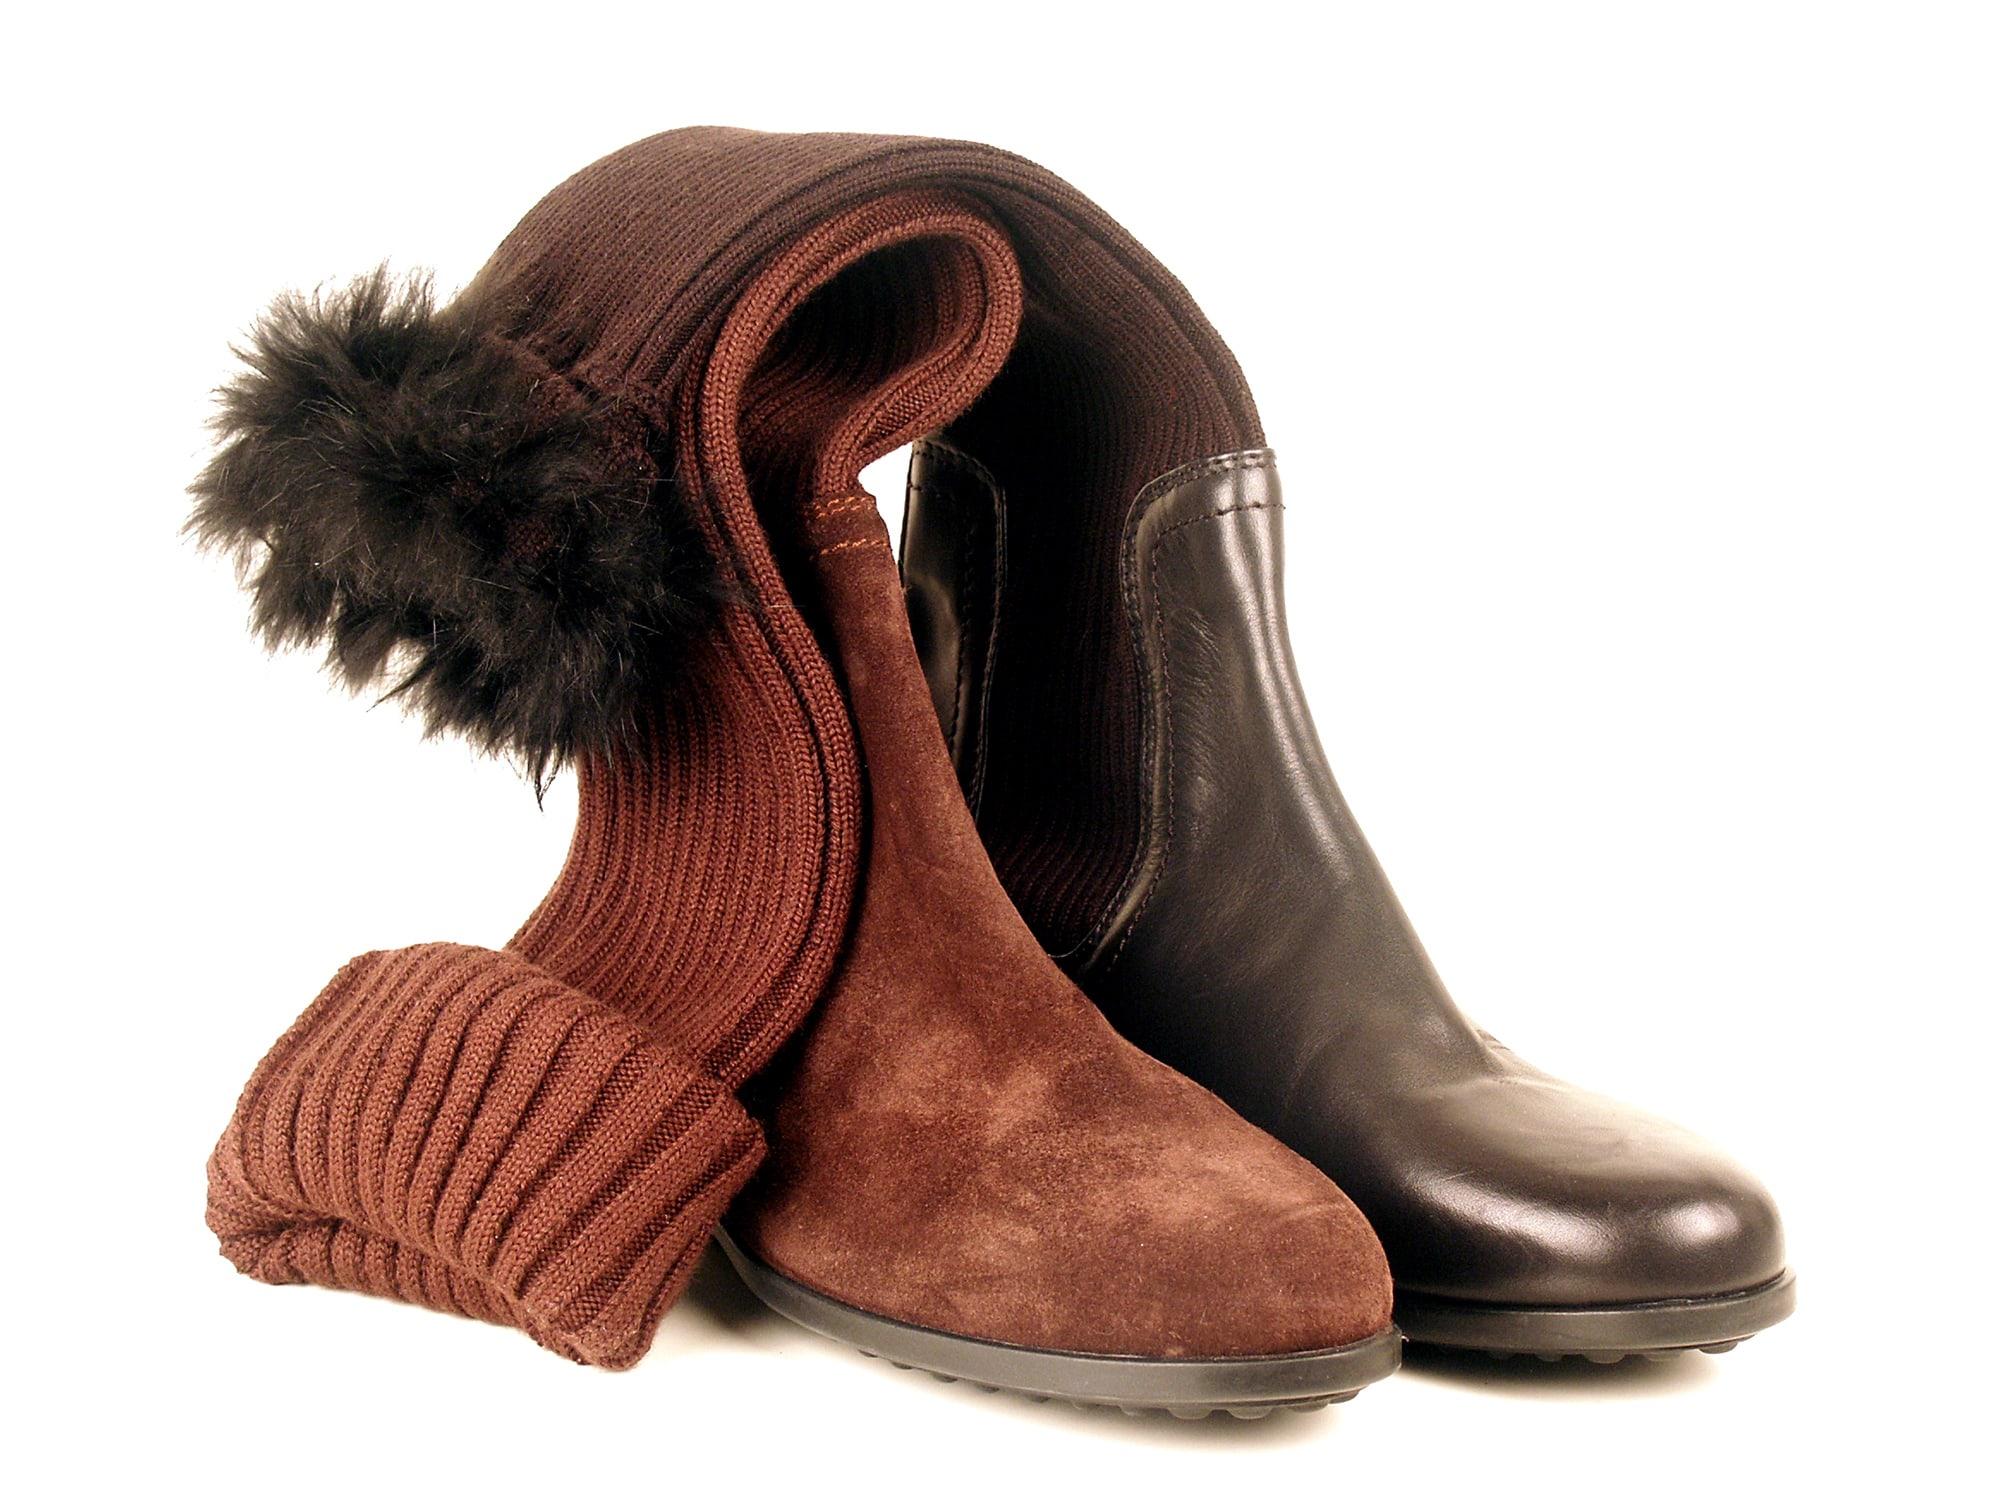 Stivali pelle e lana